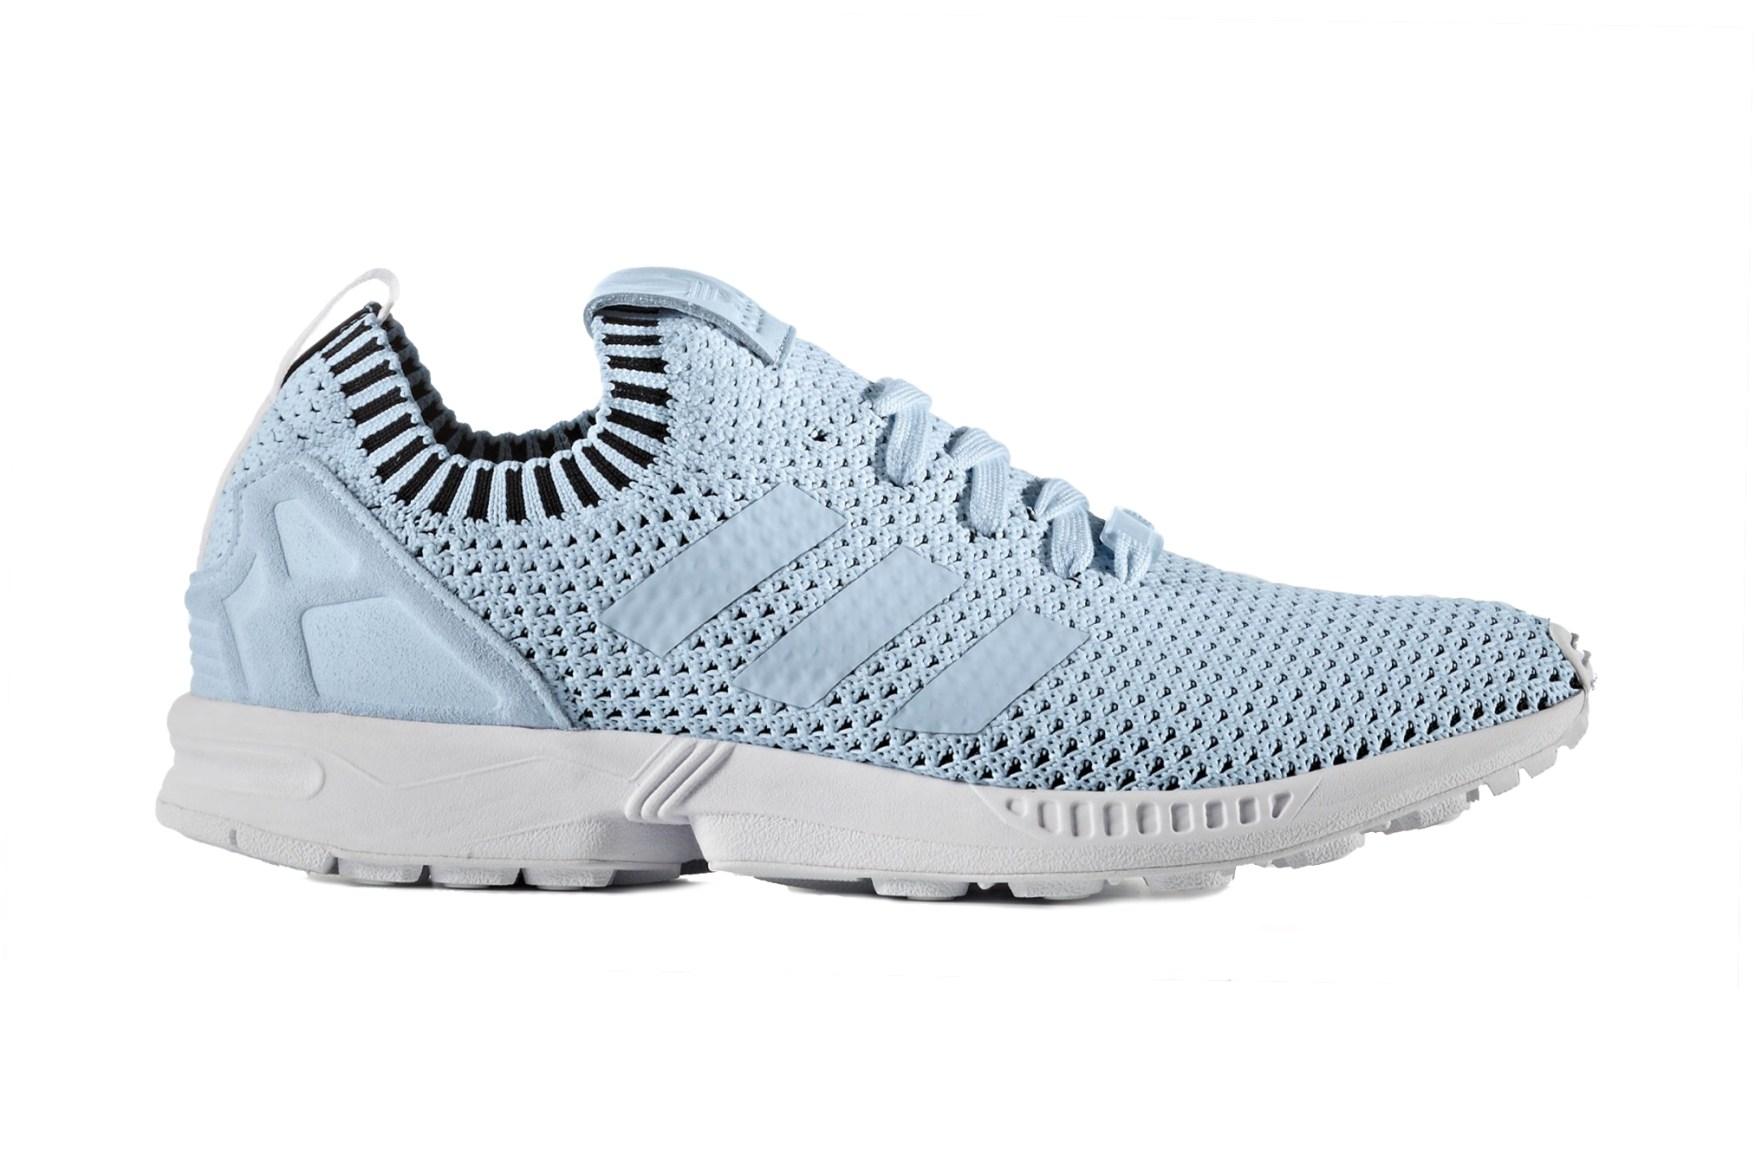 adidas zx flux primeknit sneaker hypebeast. Black Bedroom Furniture Sets. Home Design Ideas